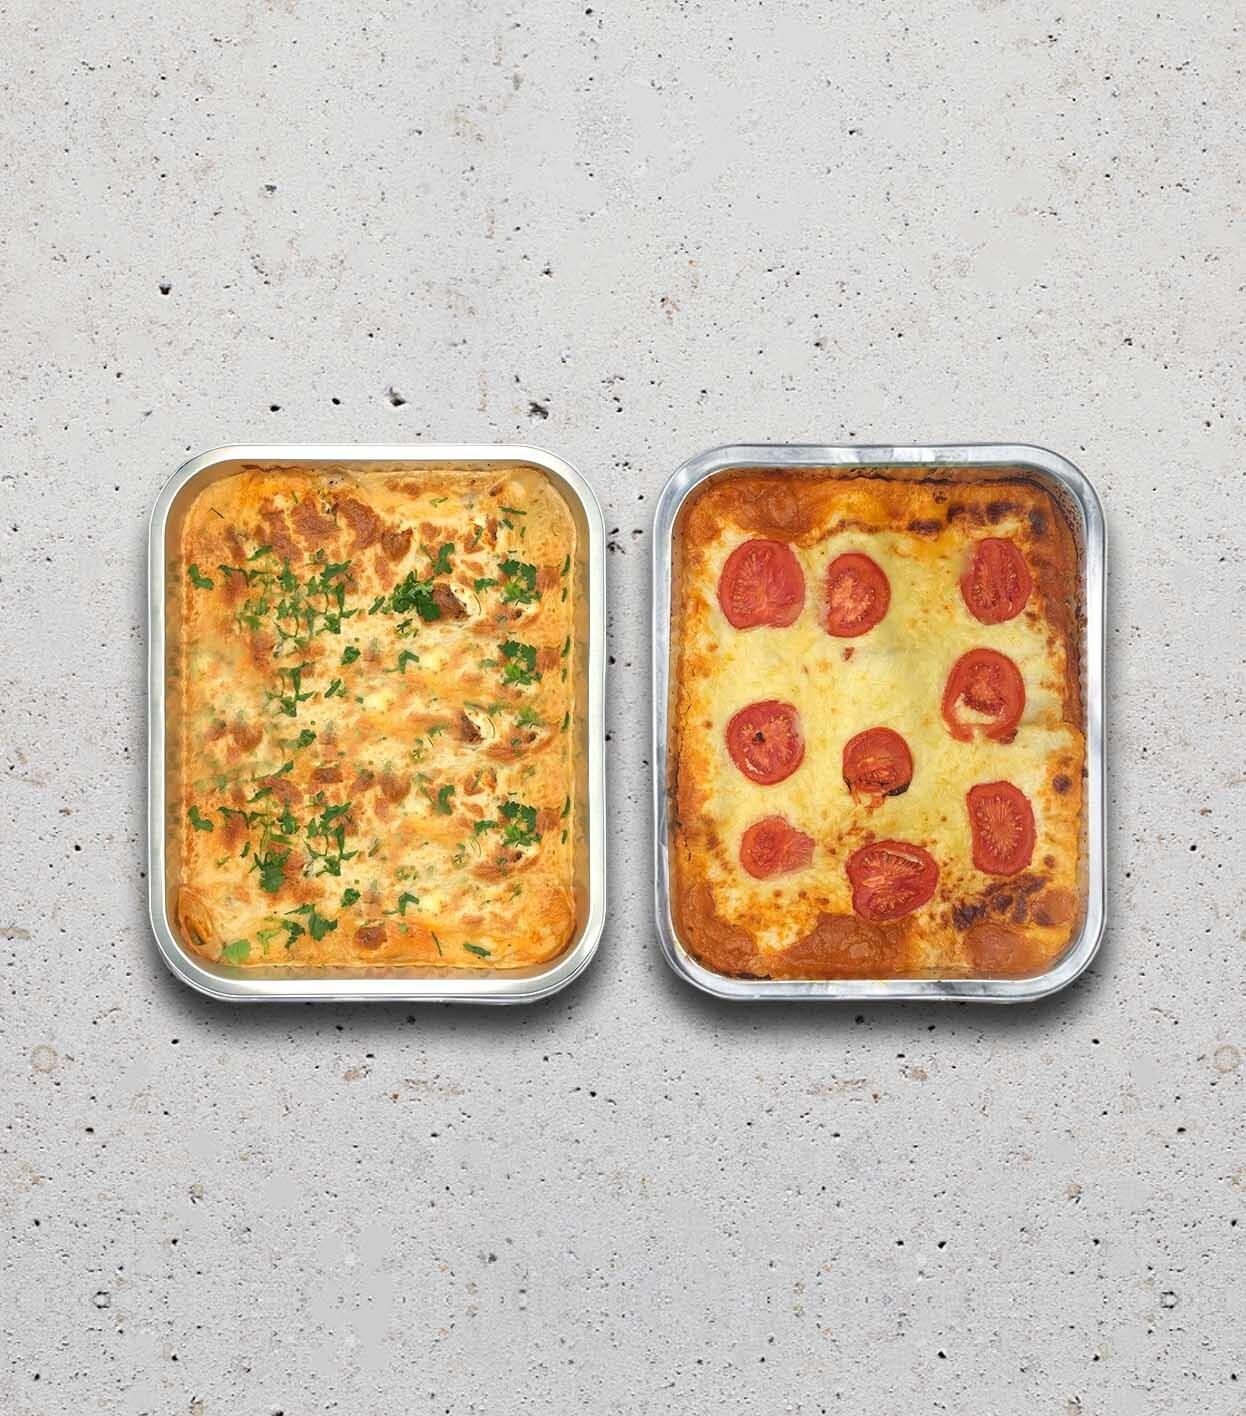 gezonde gerechten familie lasagne bolognaise moussaka ovengerecht levering